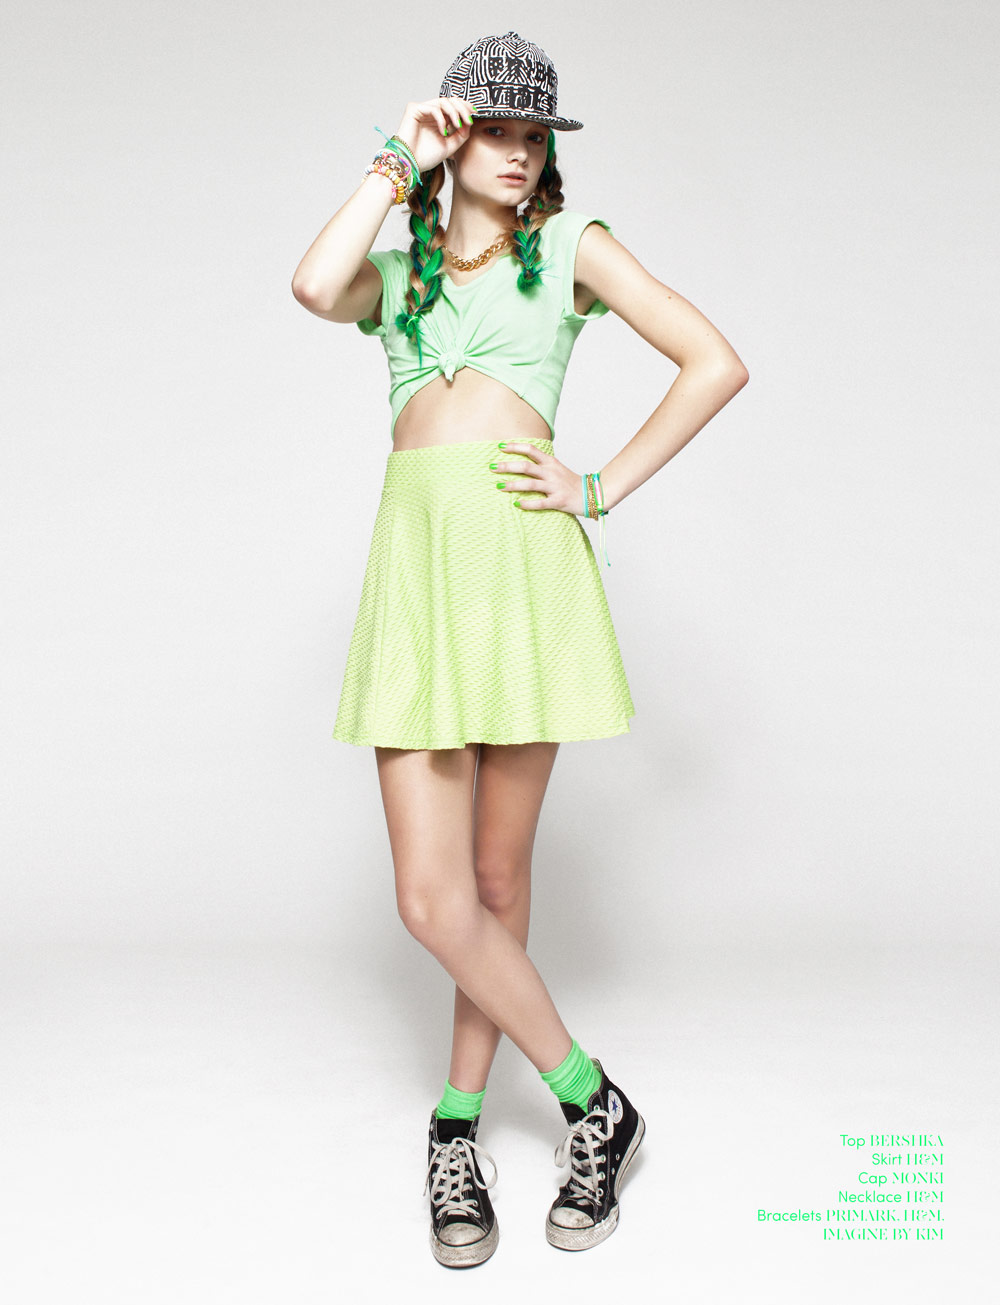 4bebb3a582e9 New in Portfolio Makeup Breakdown  Fashionmilk 4.0 – New Neons ...